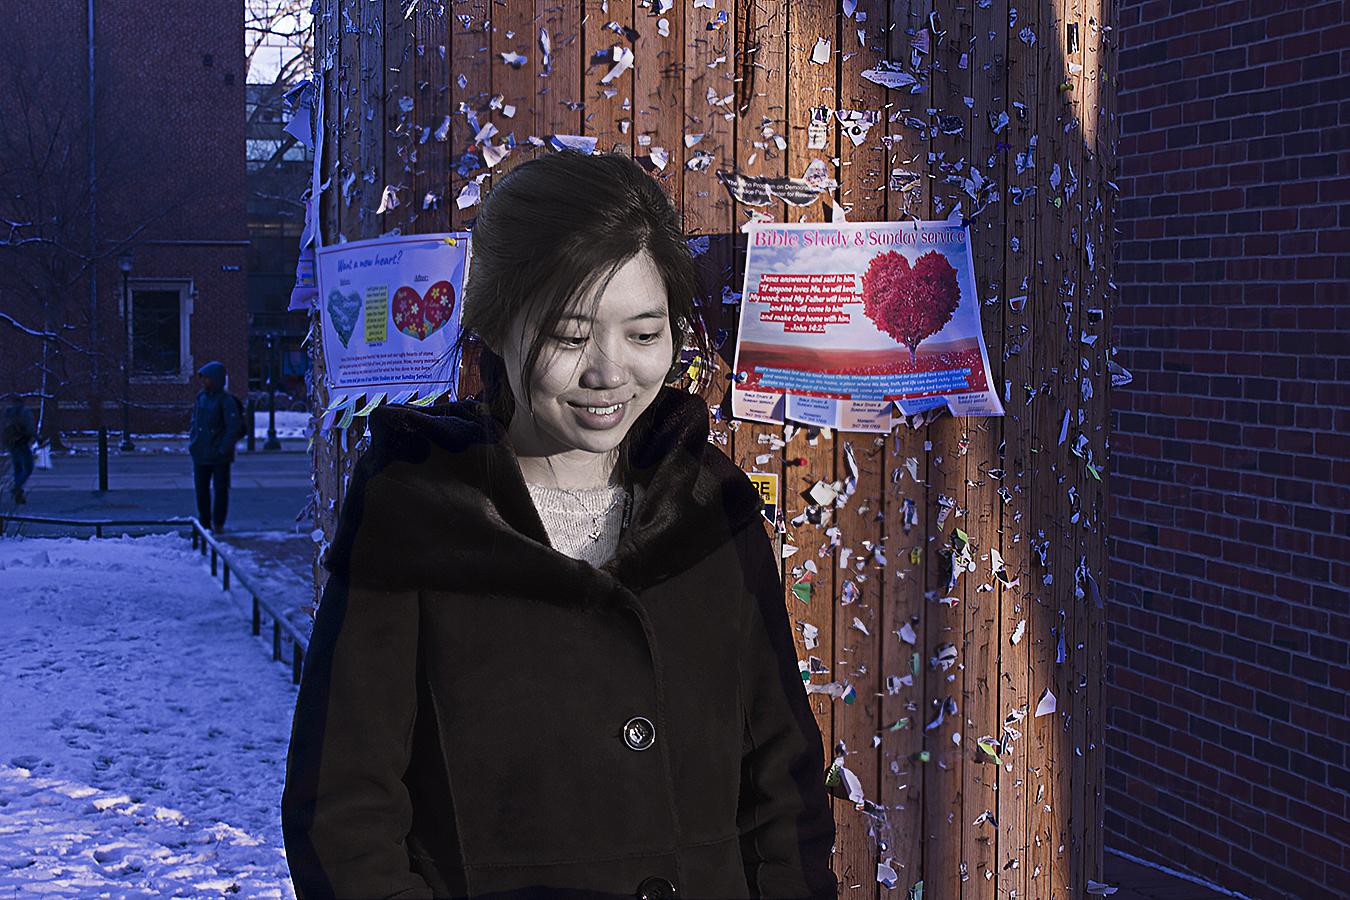 Hong_Li_Photography_Class_Location_Meyerson_Hall_School_of_Design_Philadelphia_University_City_Love_Snow_Xinxin_Shen_Landscape_Architecture